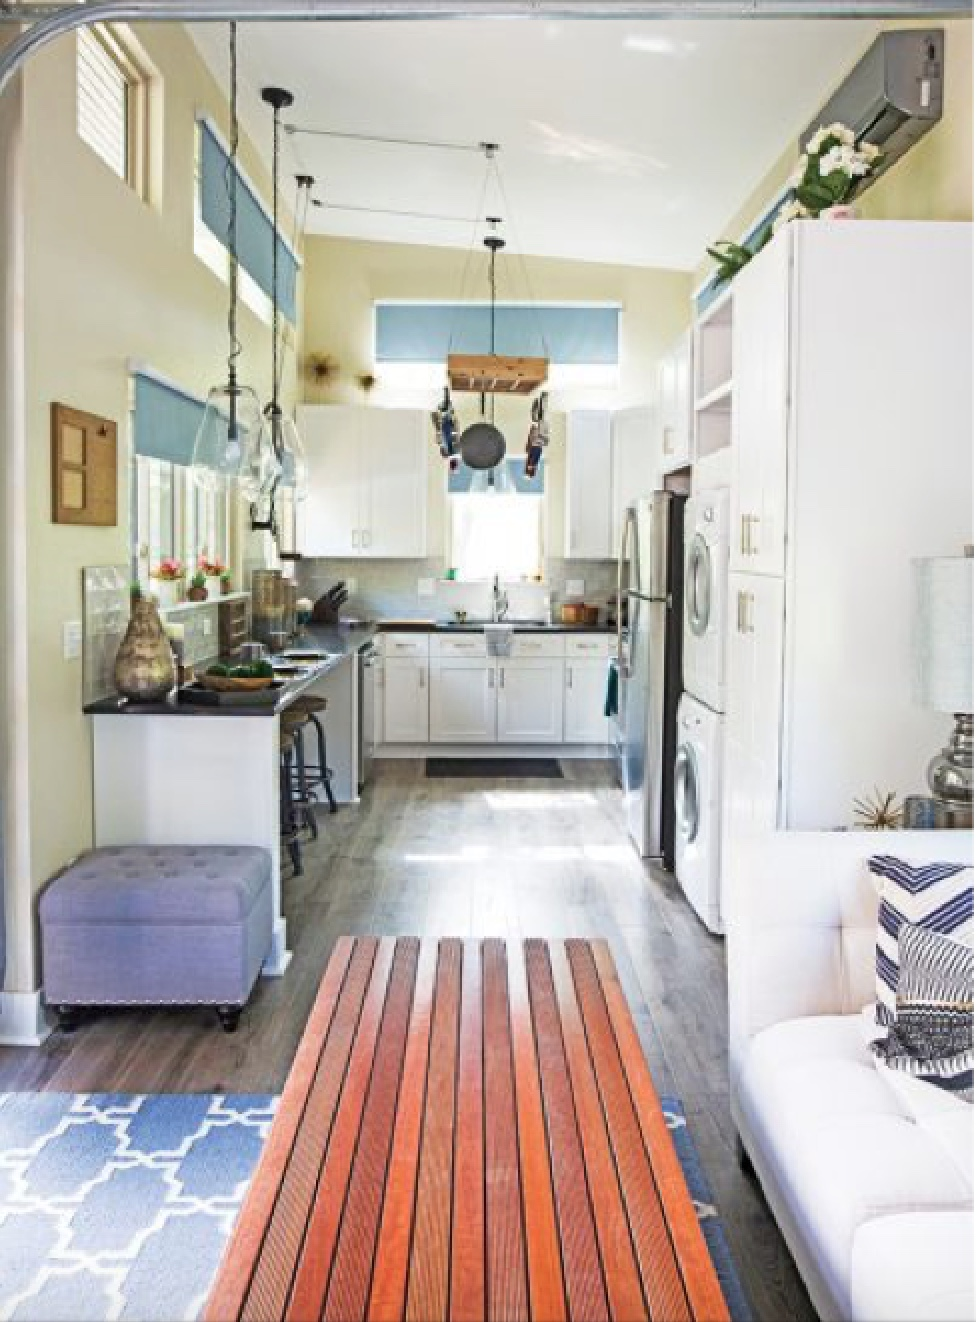 4 kitchen interior.jpeg